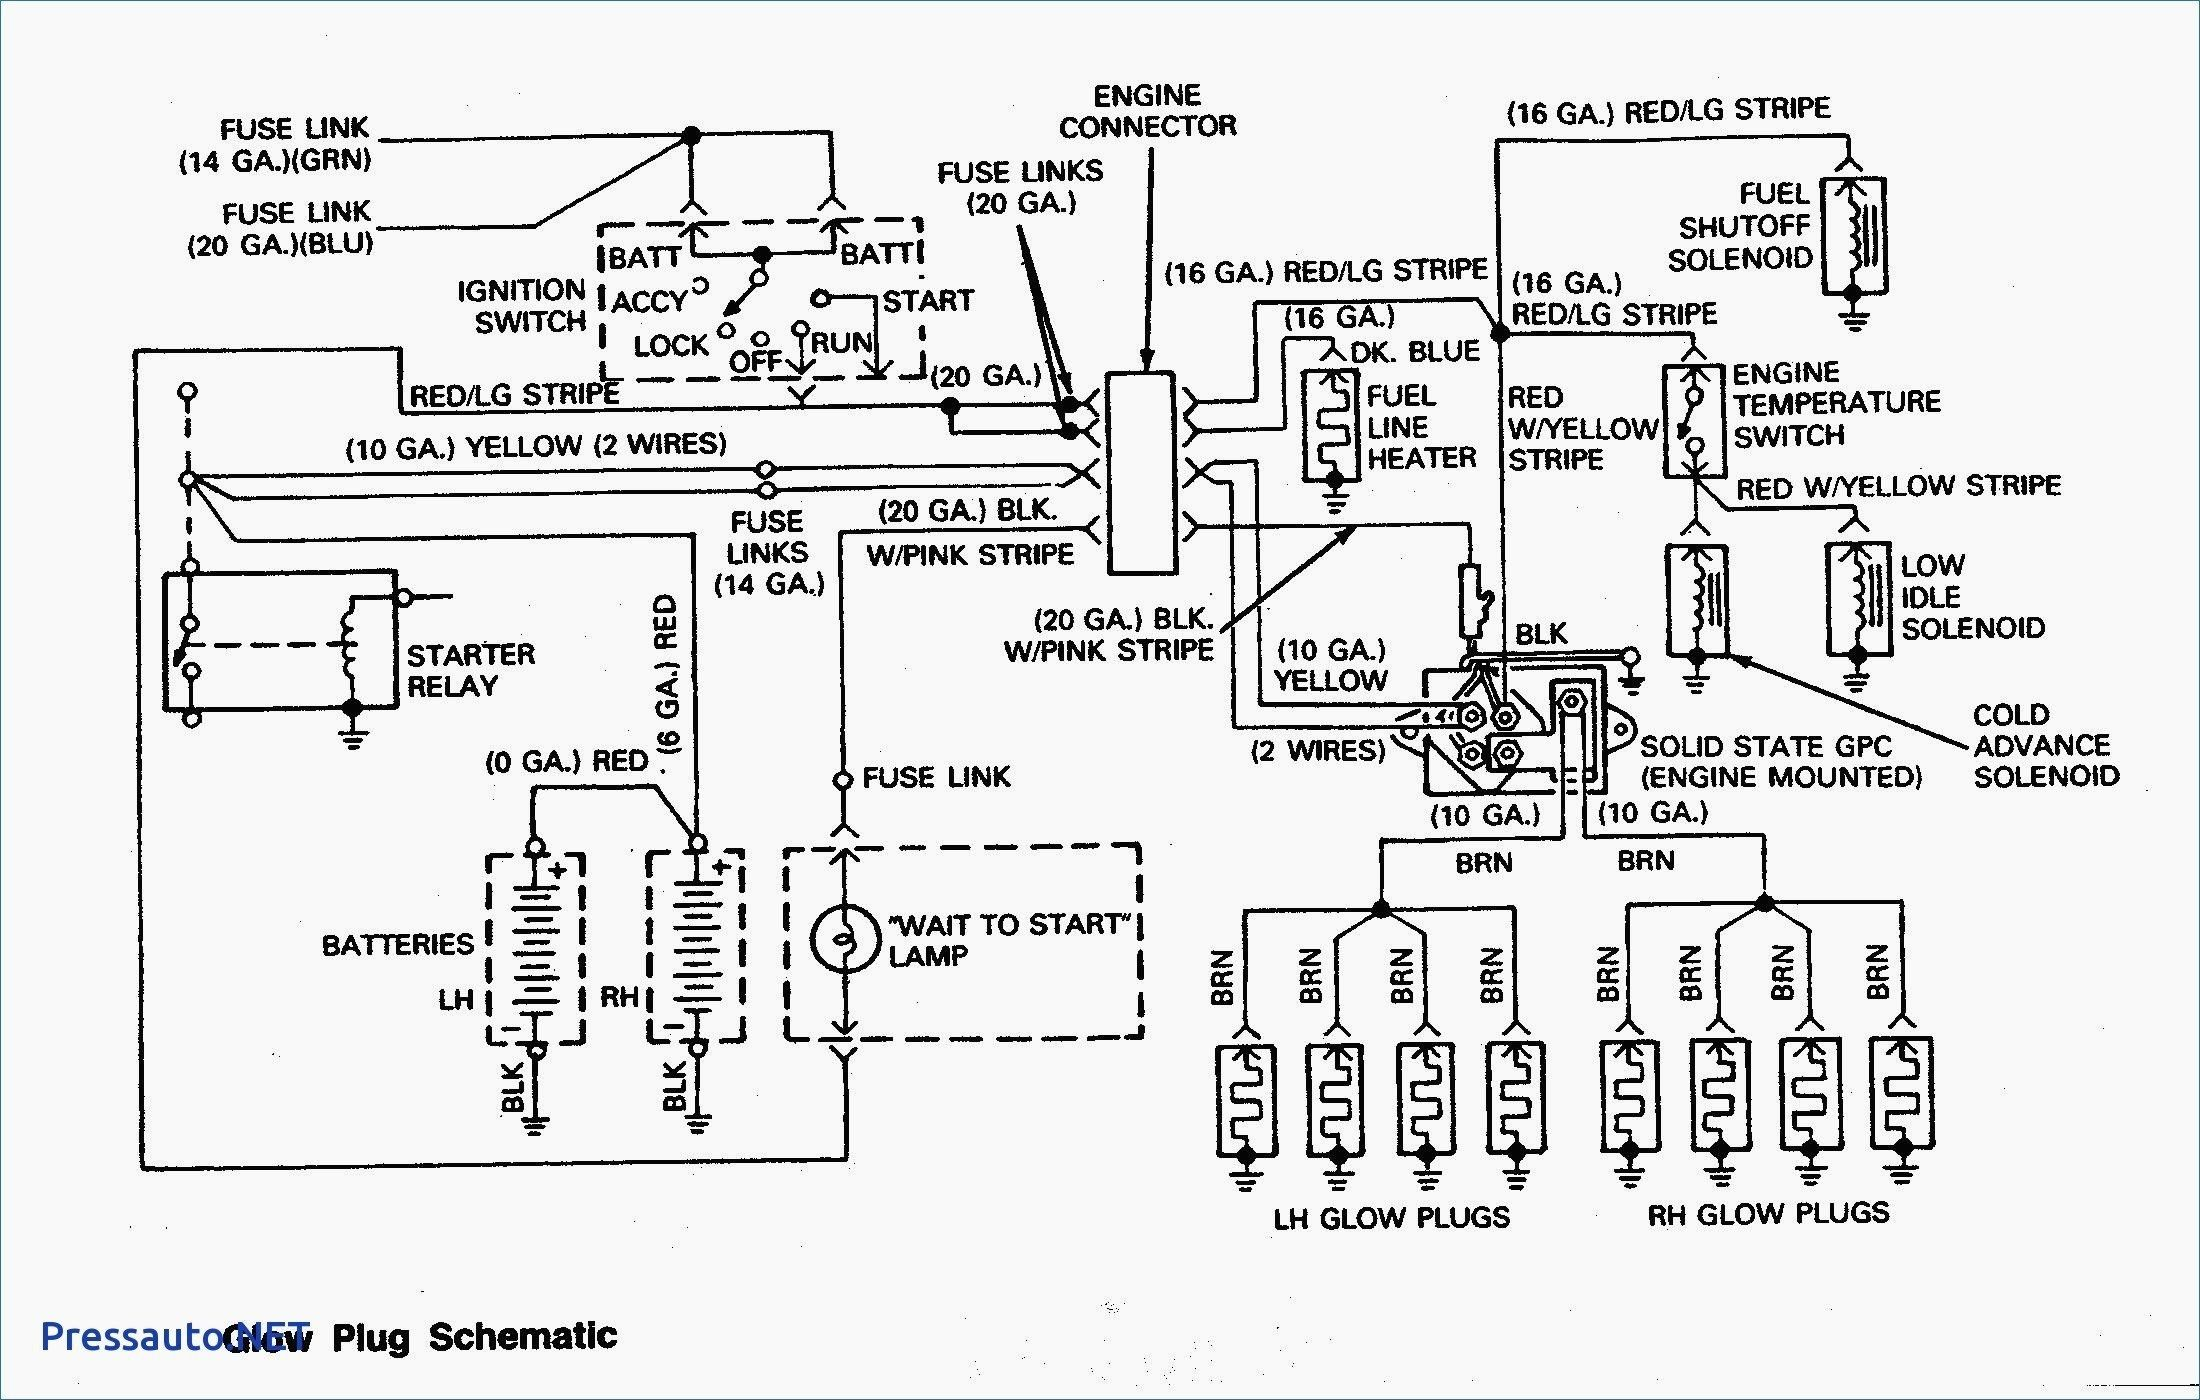 Stupendous 97 F350 Gpr Wiring Diagram Basic Electronics Wiring Diagram Wiring Cloud Onicaxeromohammedshrineorg